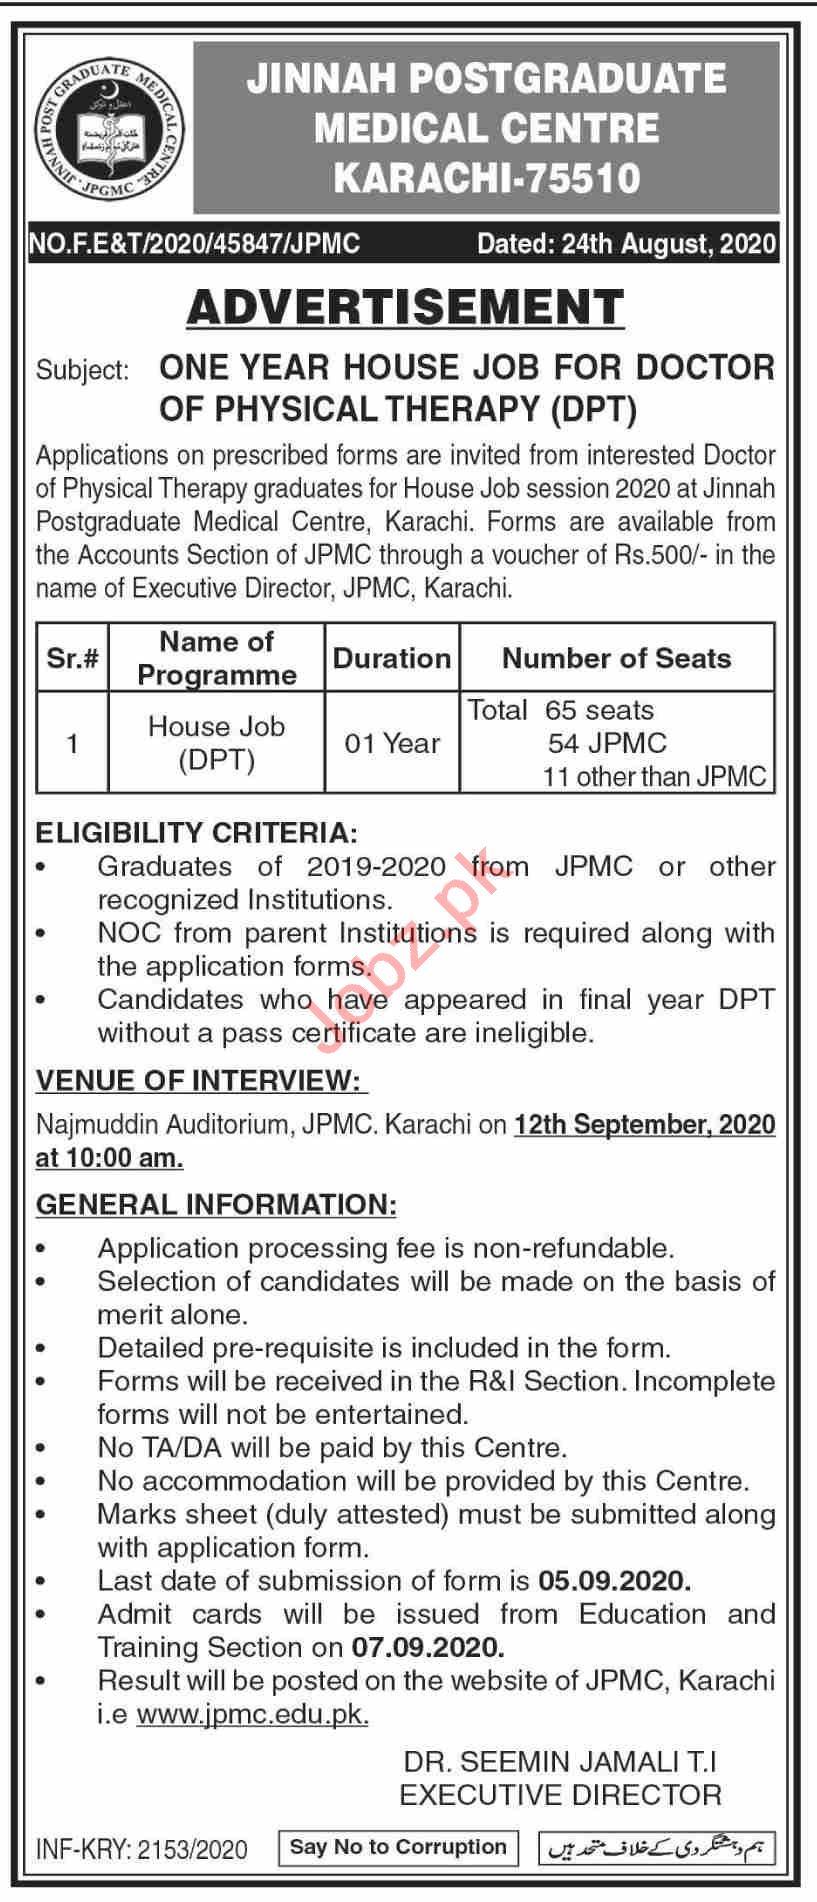 Jinnah Postgraduate Medical Centre JPMC Karachi Jobs 2020